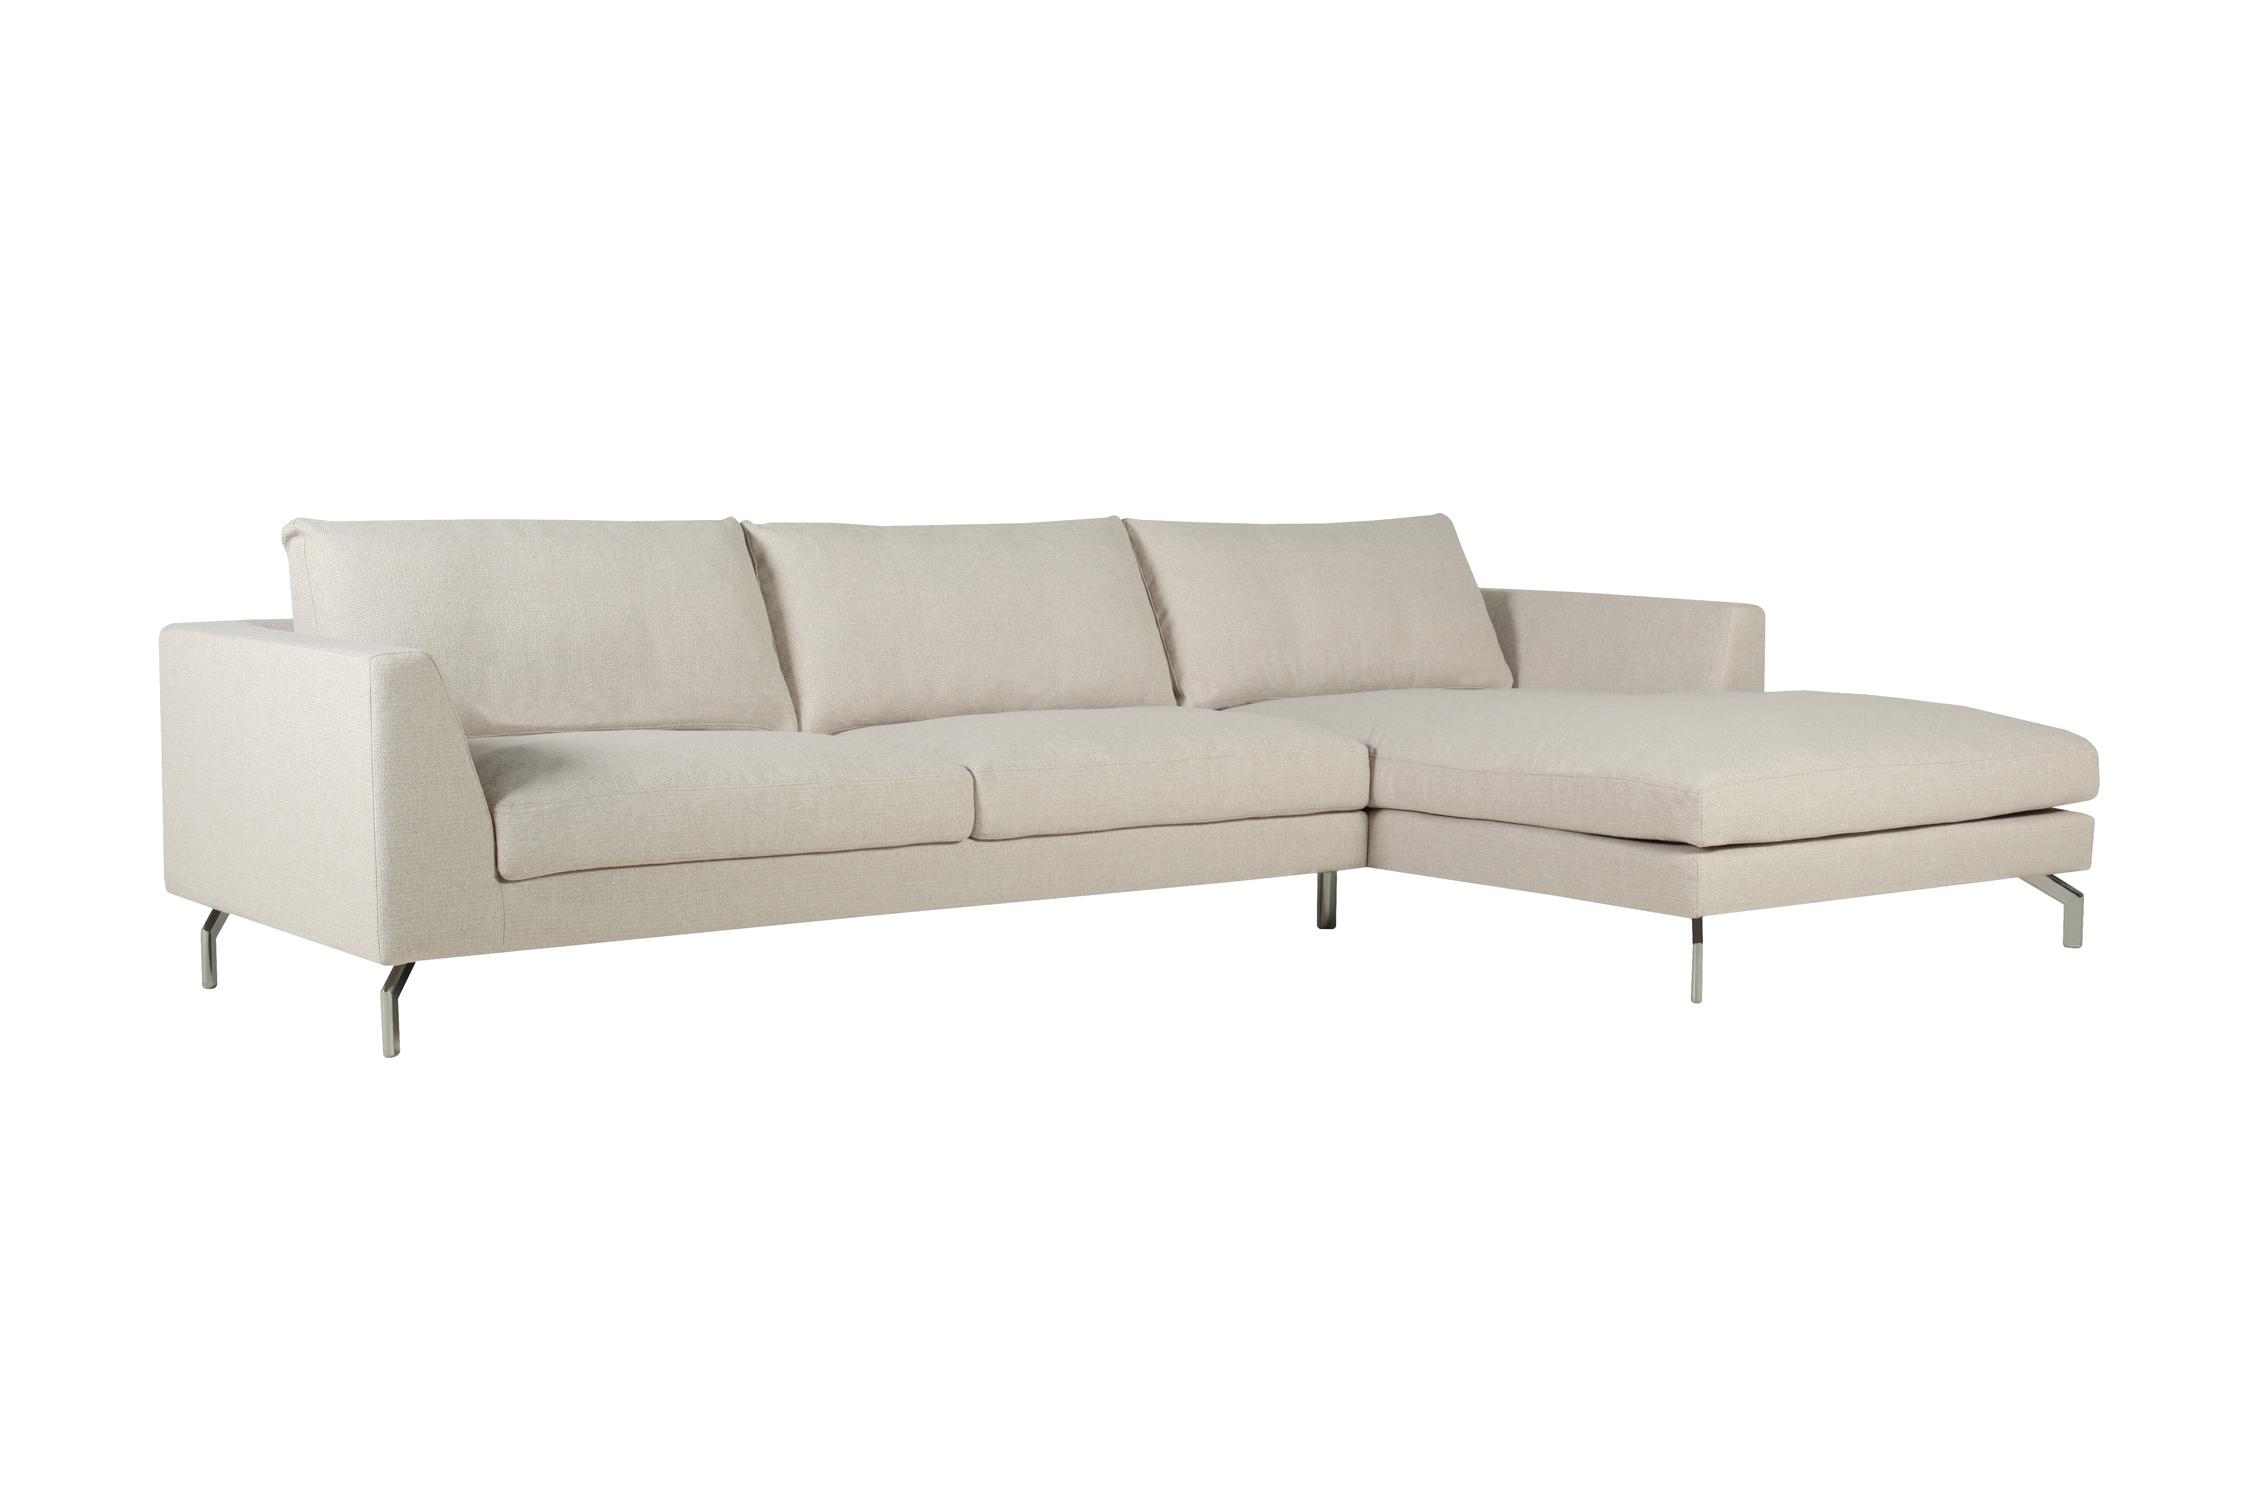 Allegra Set 1 Sofa With Chaiselongue-33209